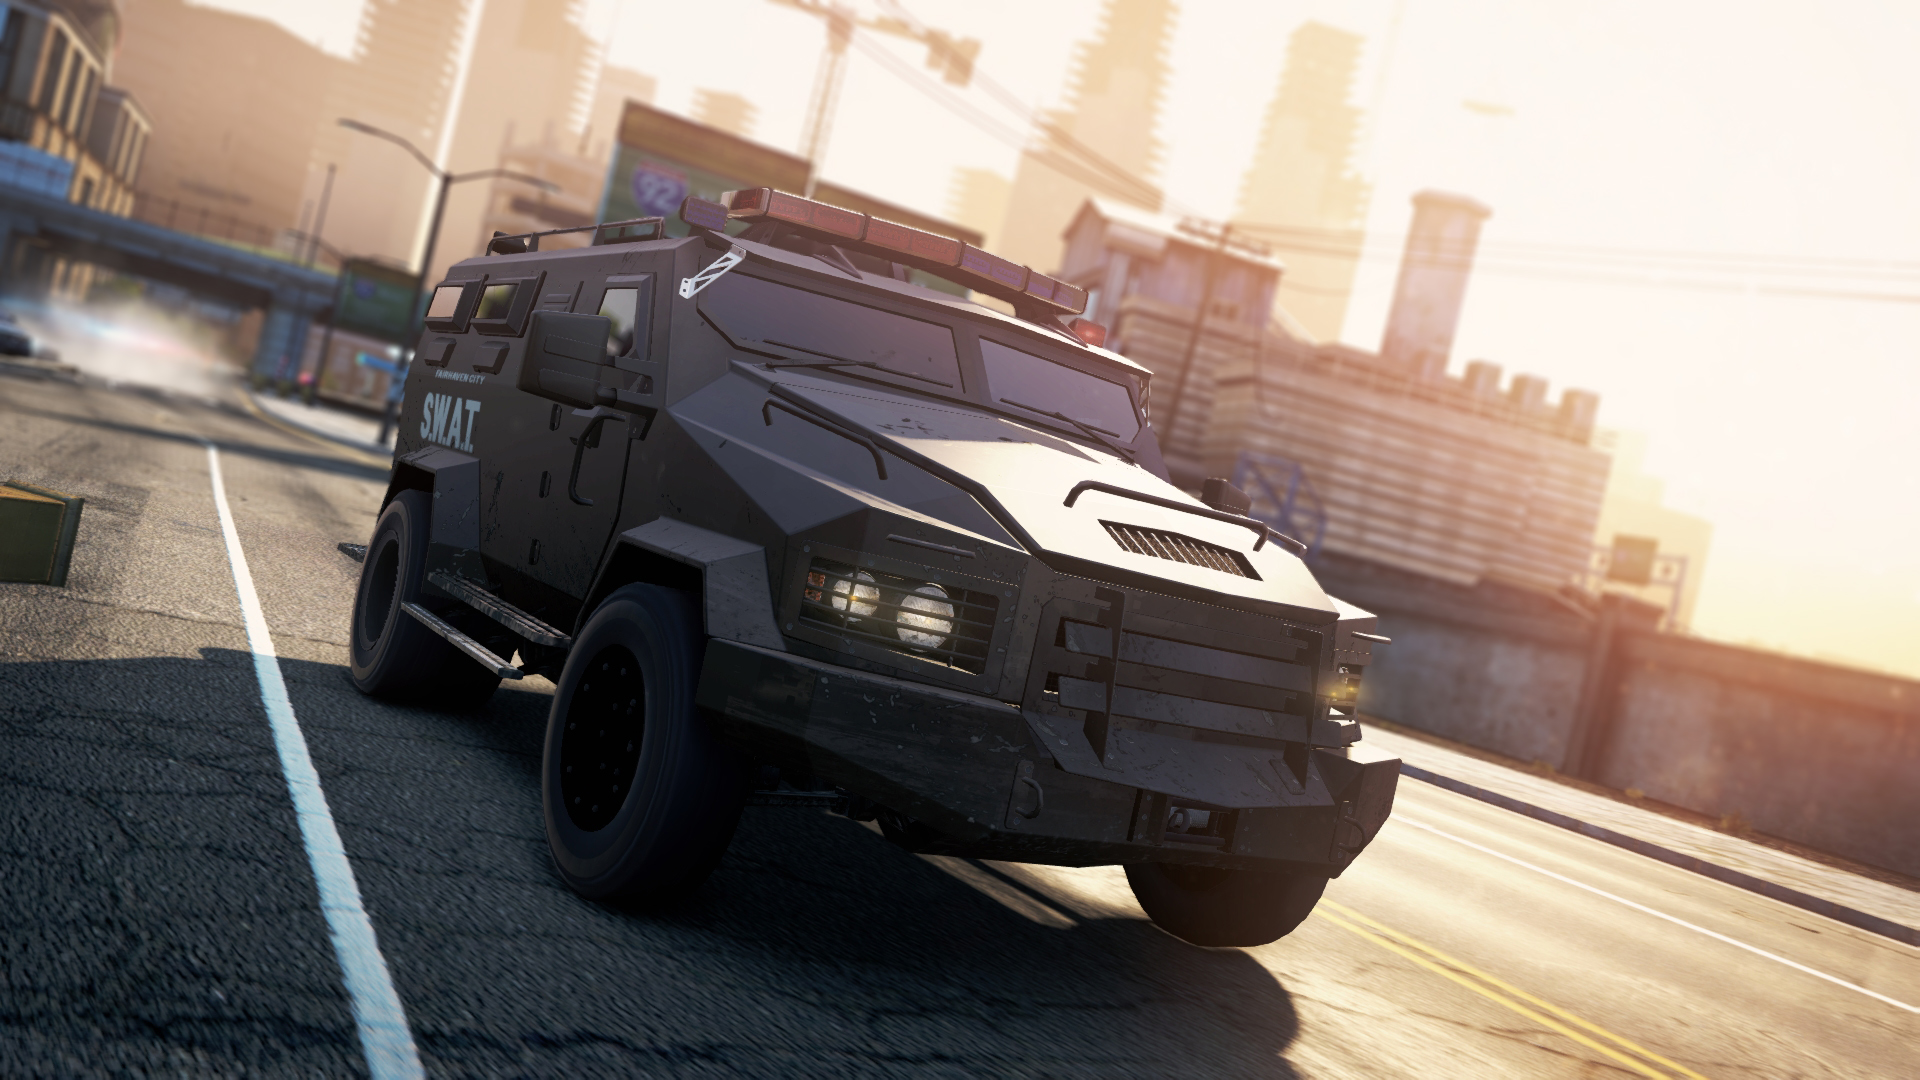 Swat Truck Need For Speed Wiki Fandom Powered By Wikia